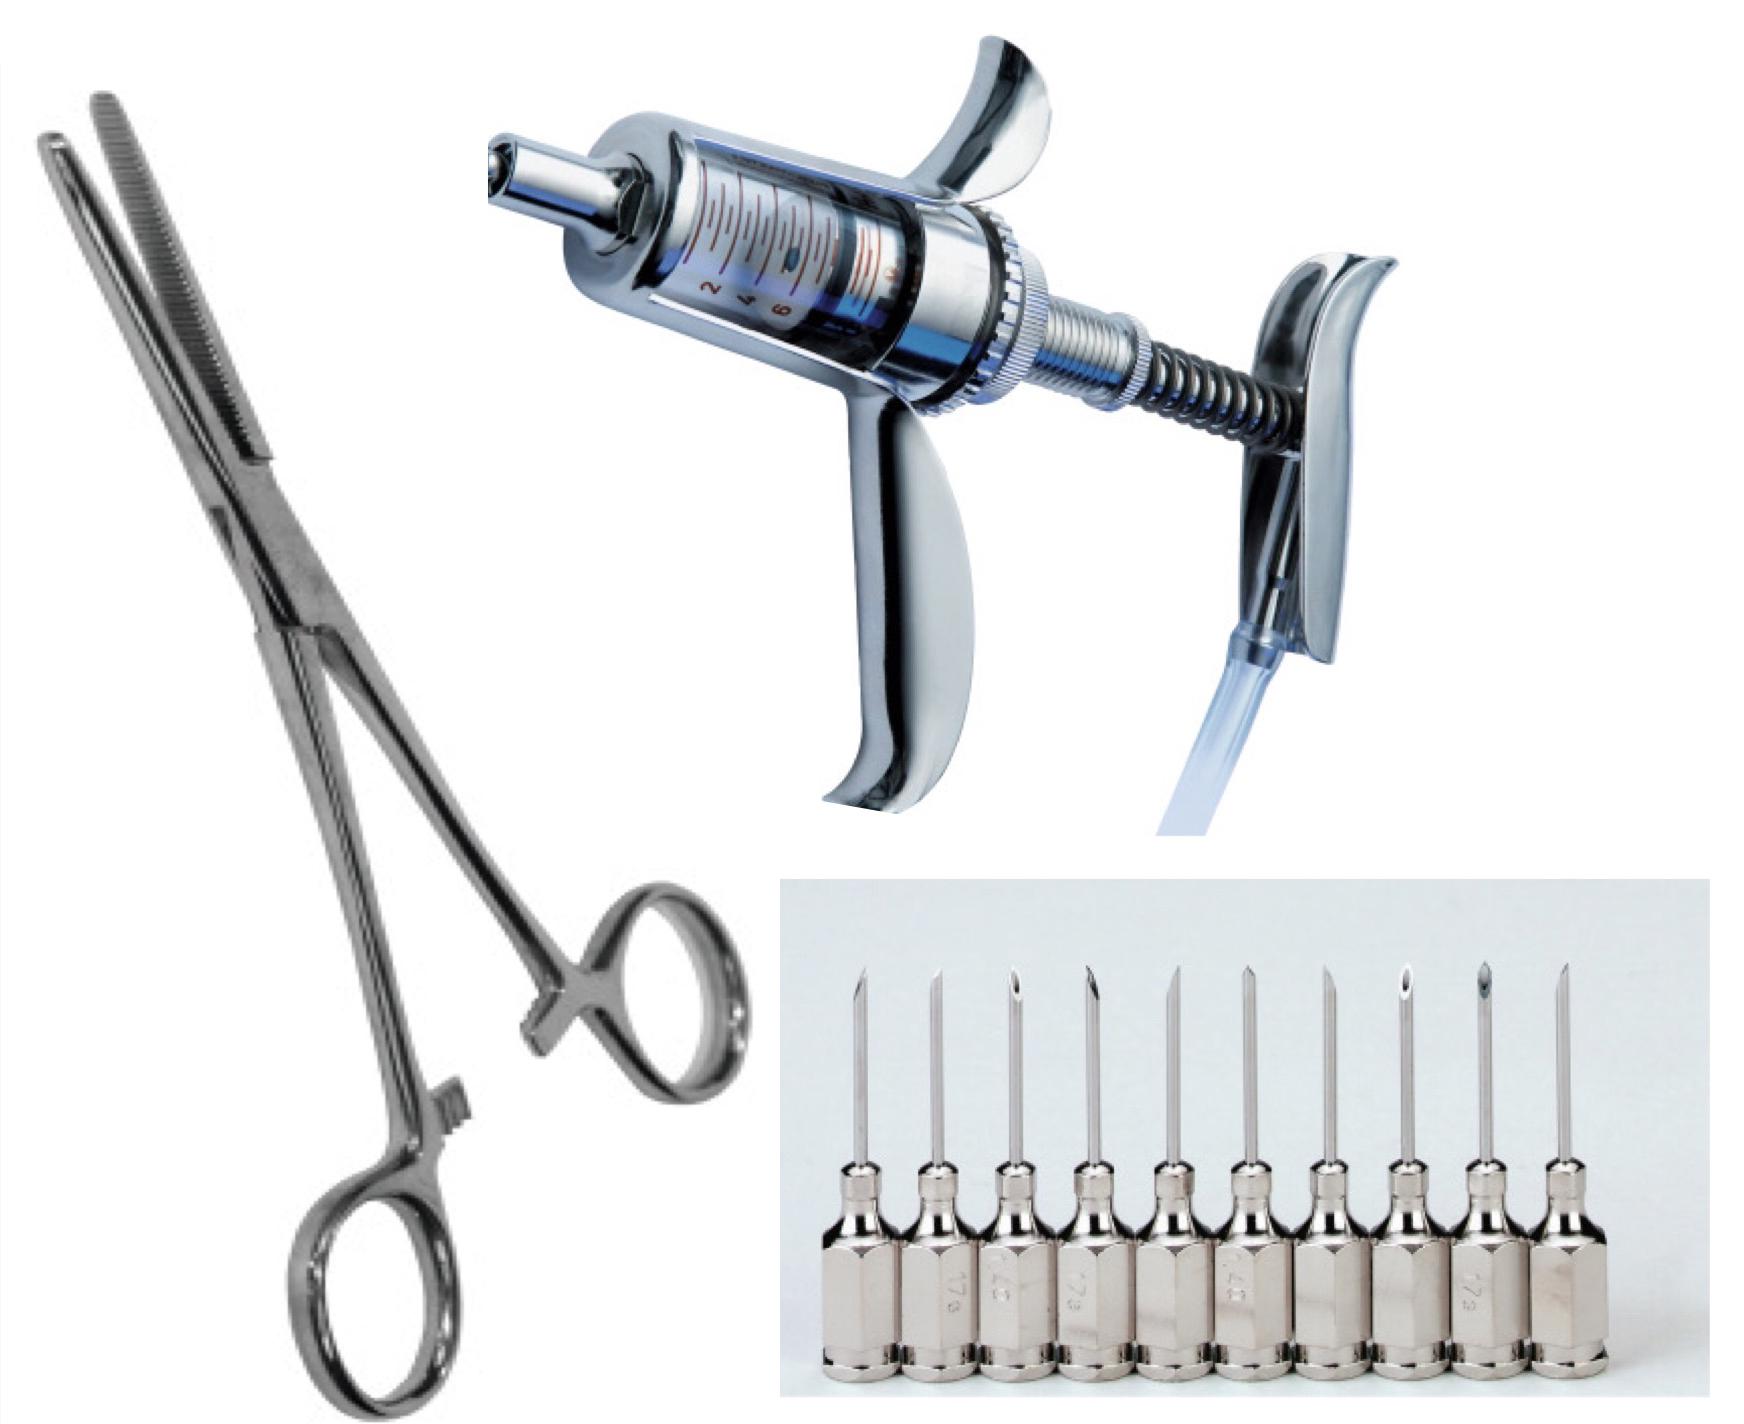 ابزار جراحی دامپزشکی آلمانی